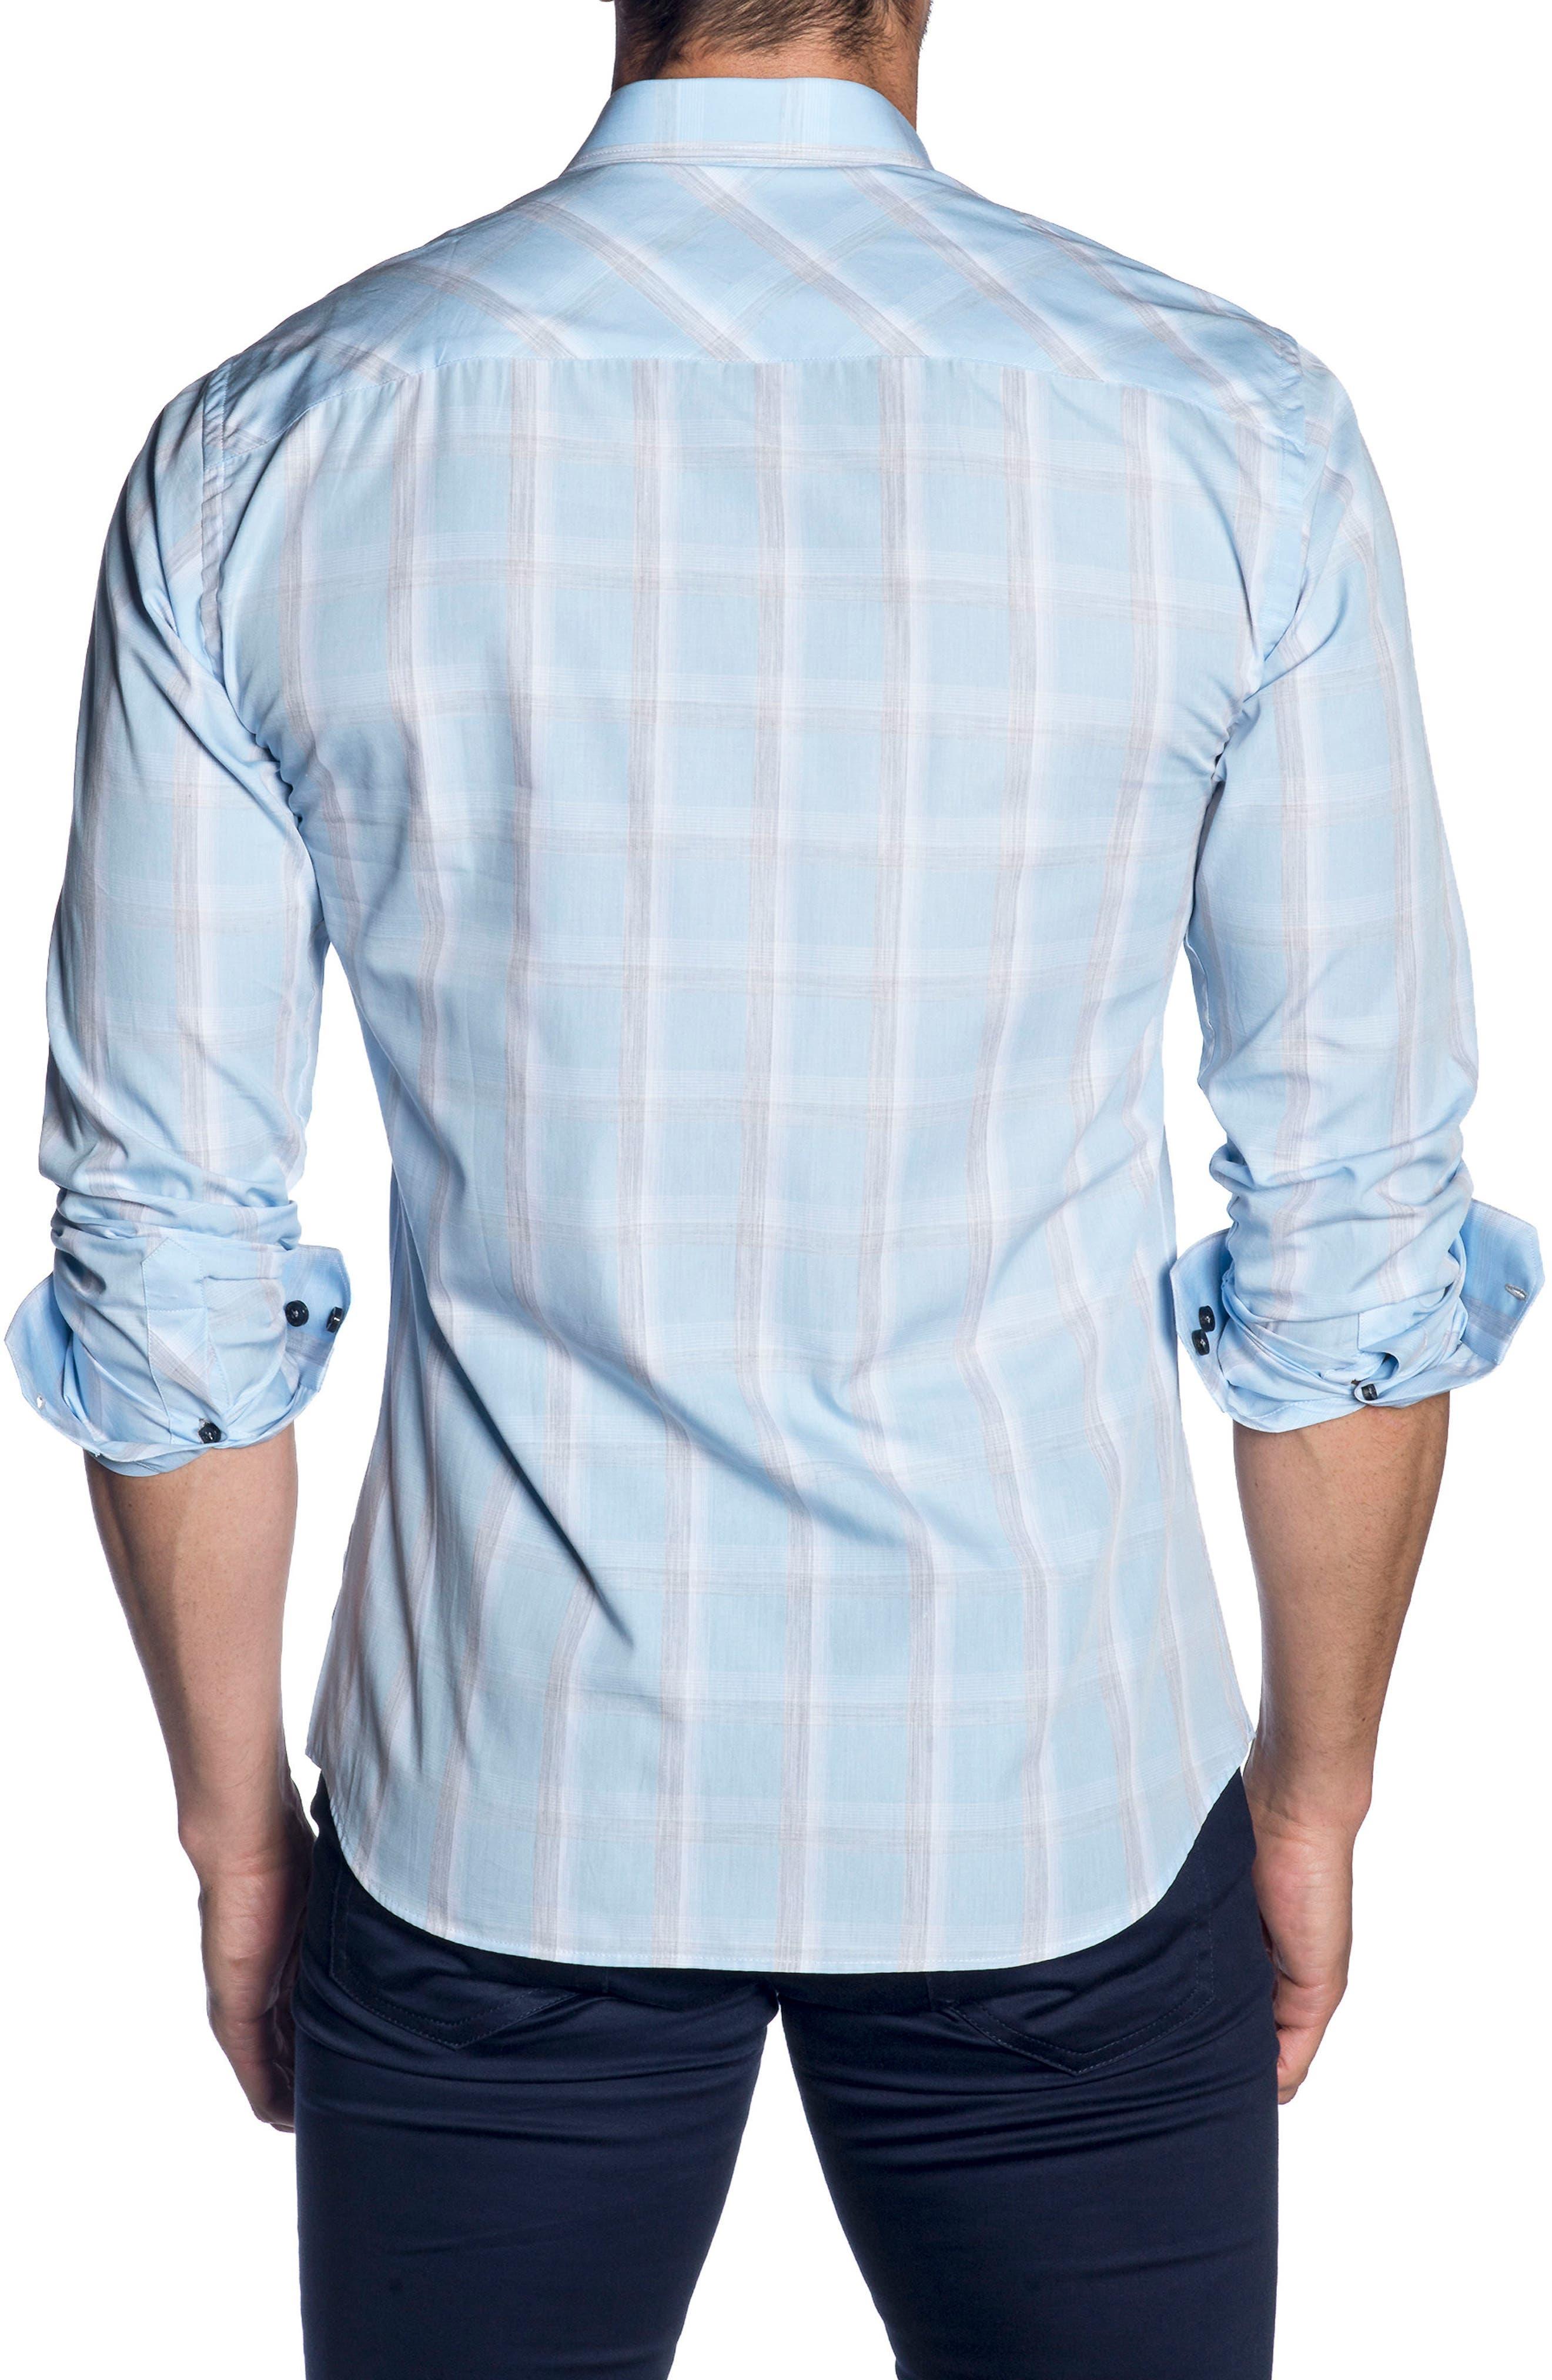 Trim Fit Sport Shirt,                             Alternate thumbnail 2, color,                             SKY BLUE GREY CHECK